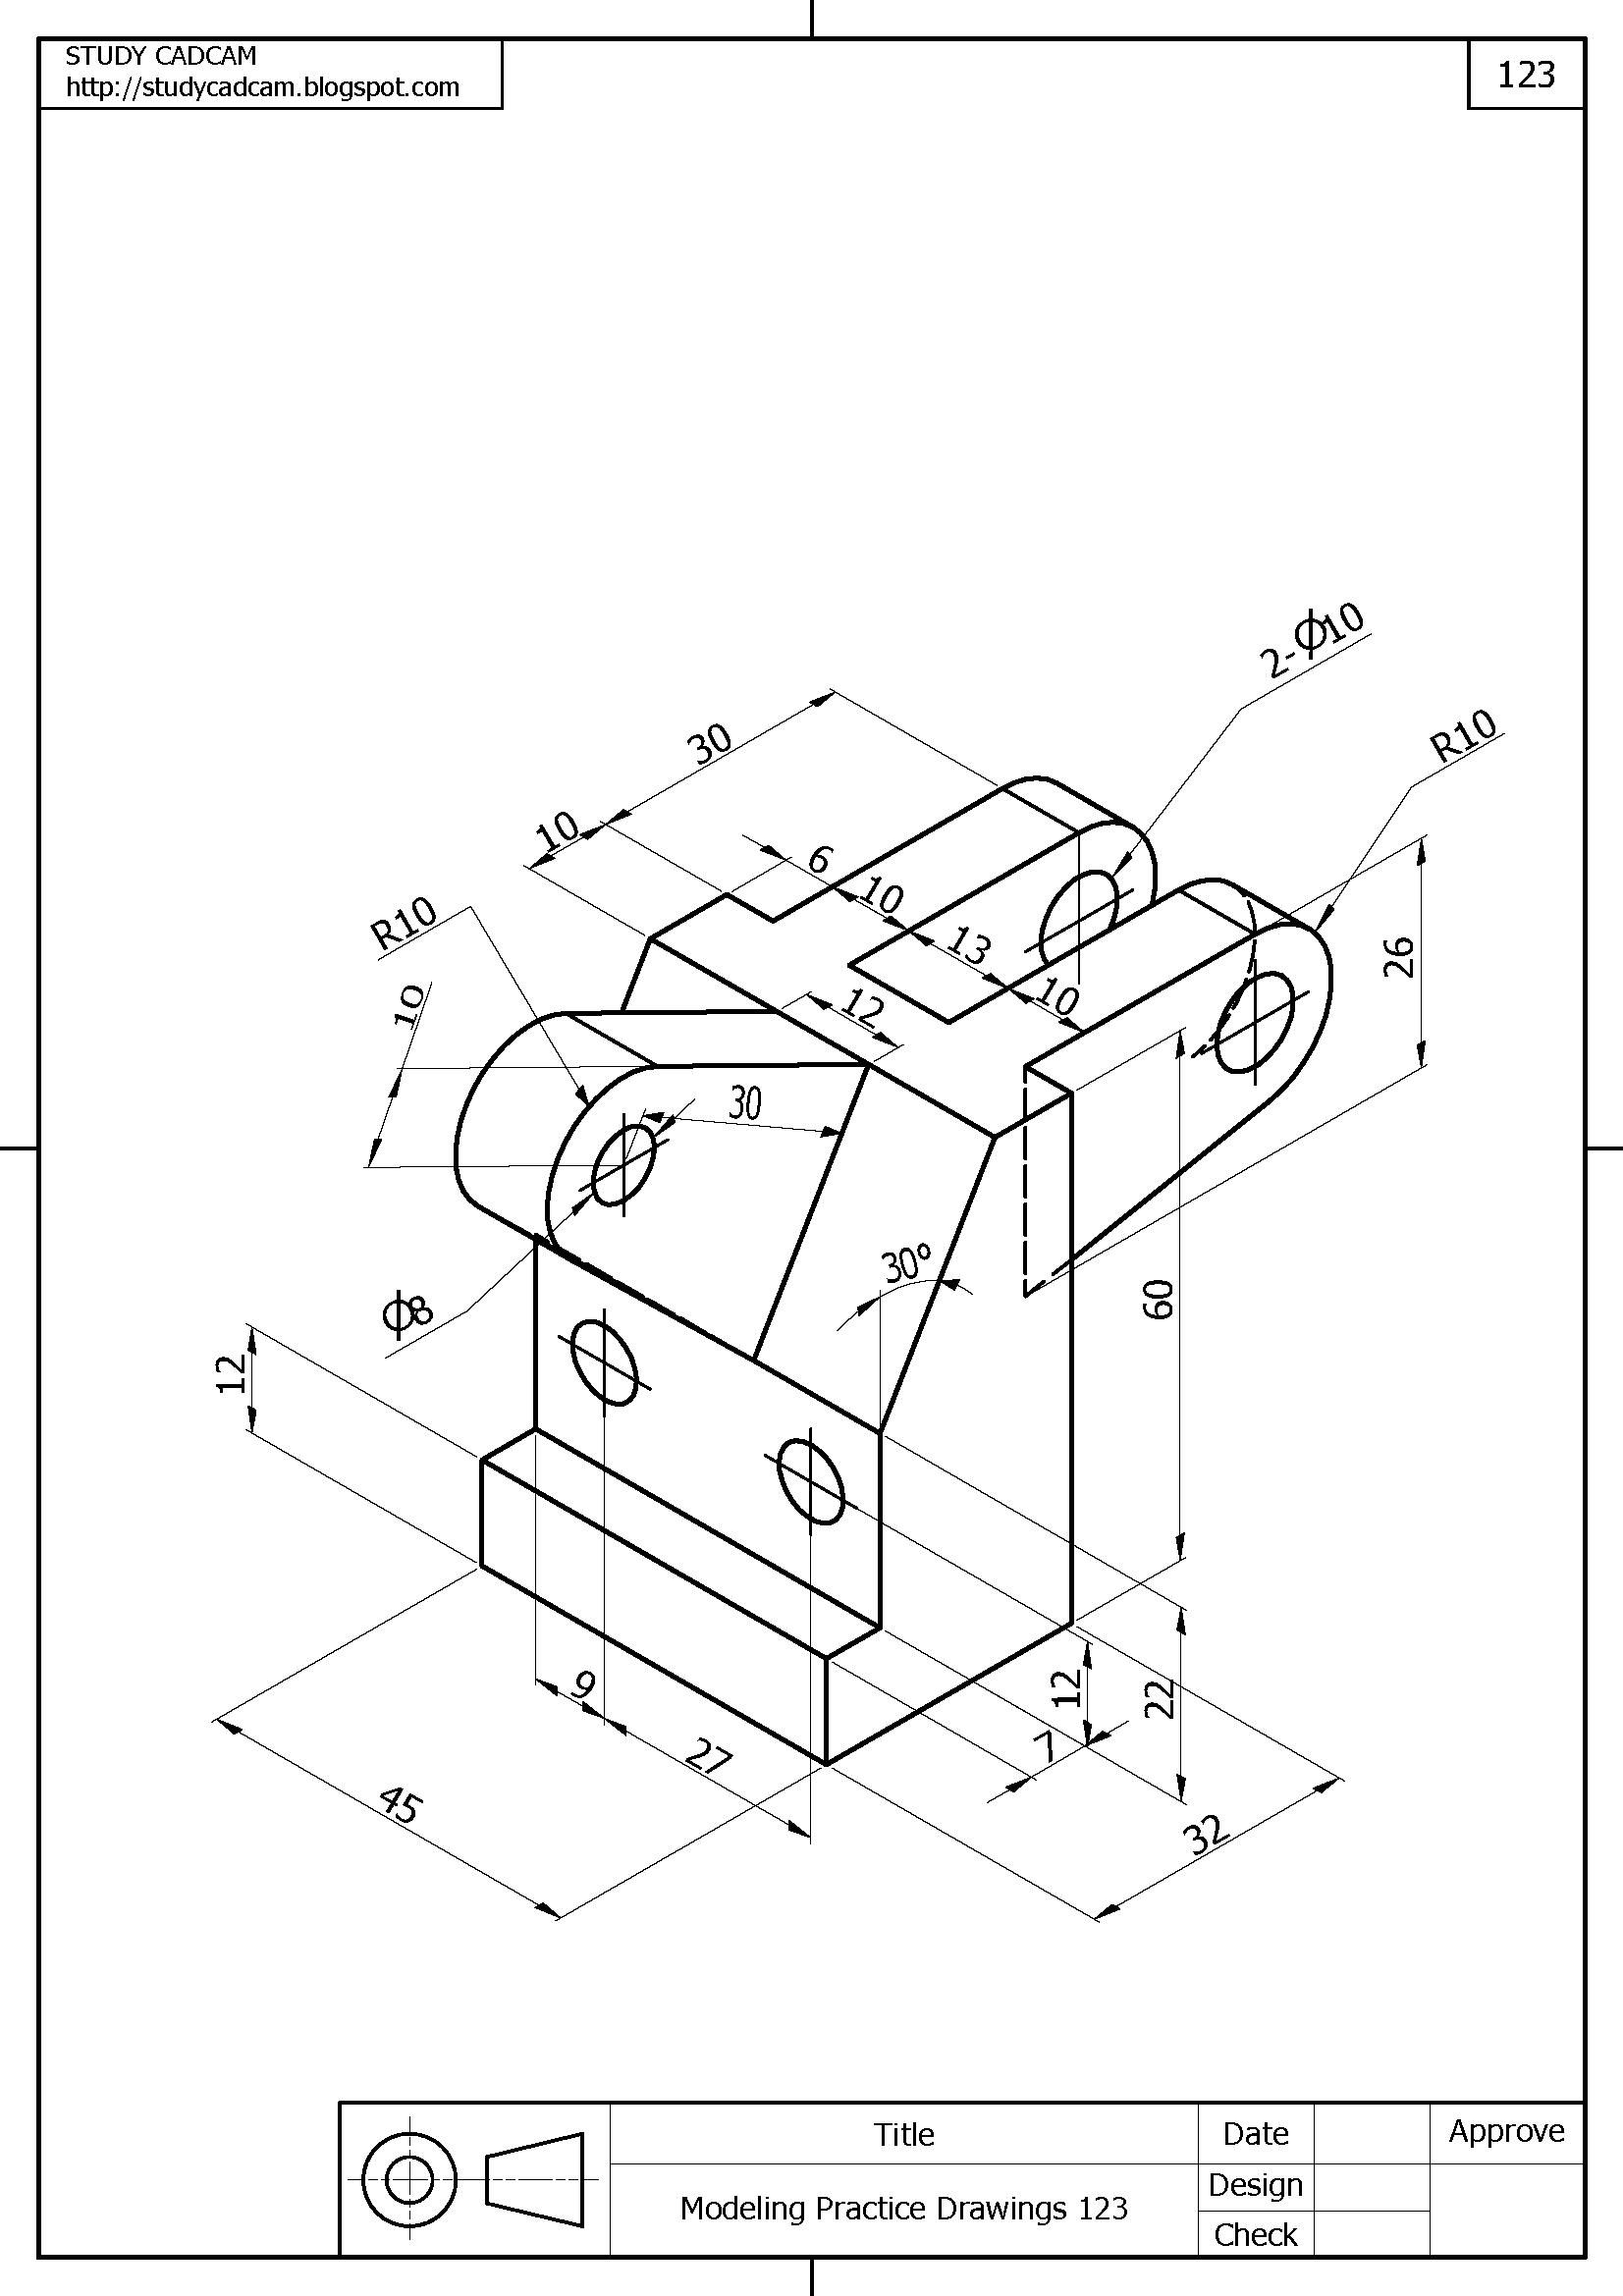 1653x2339 Pin By Mohammad Al Ahmad On Drawing Autocad, Draw